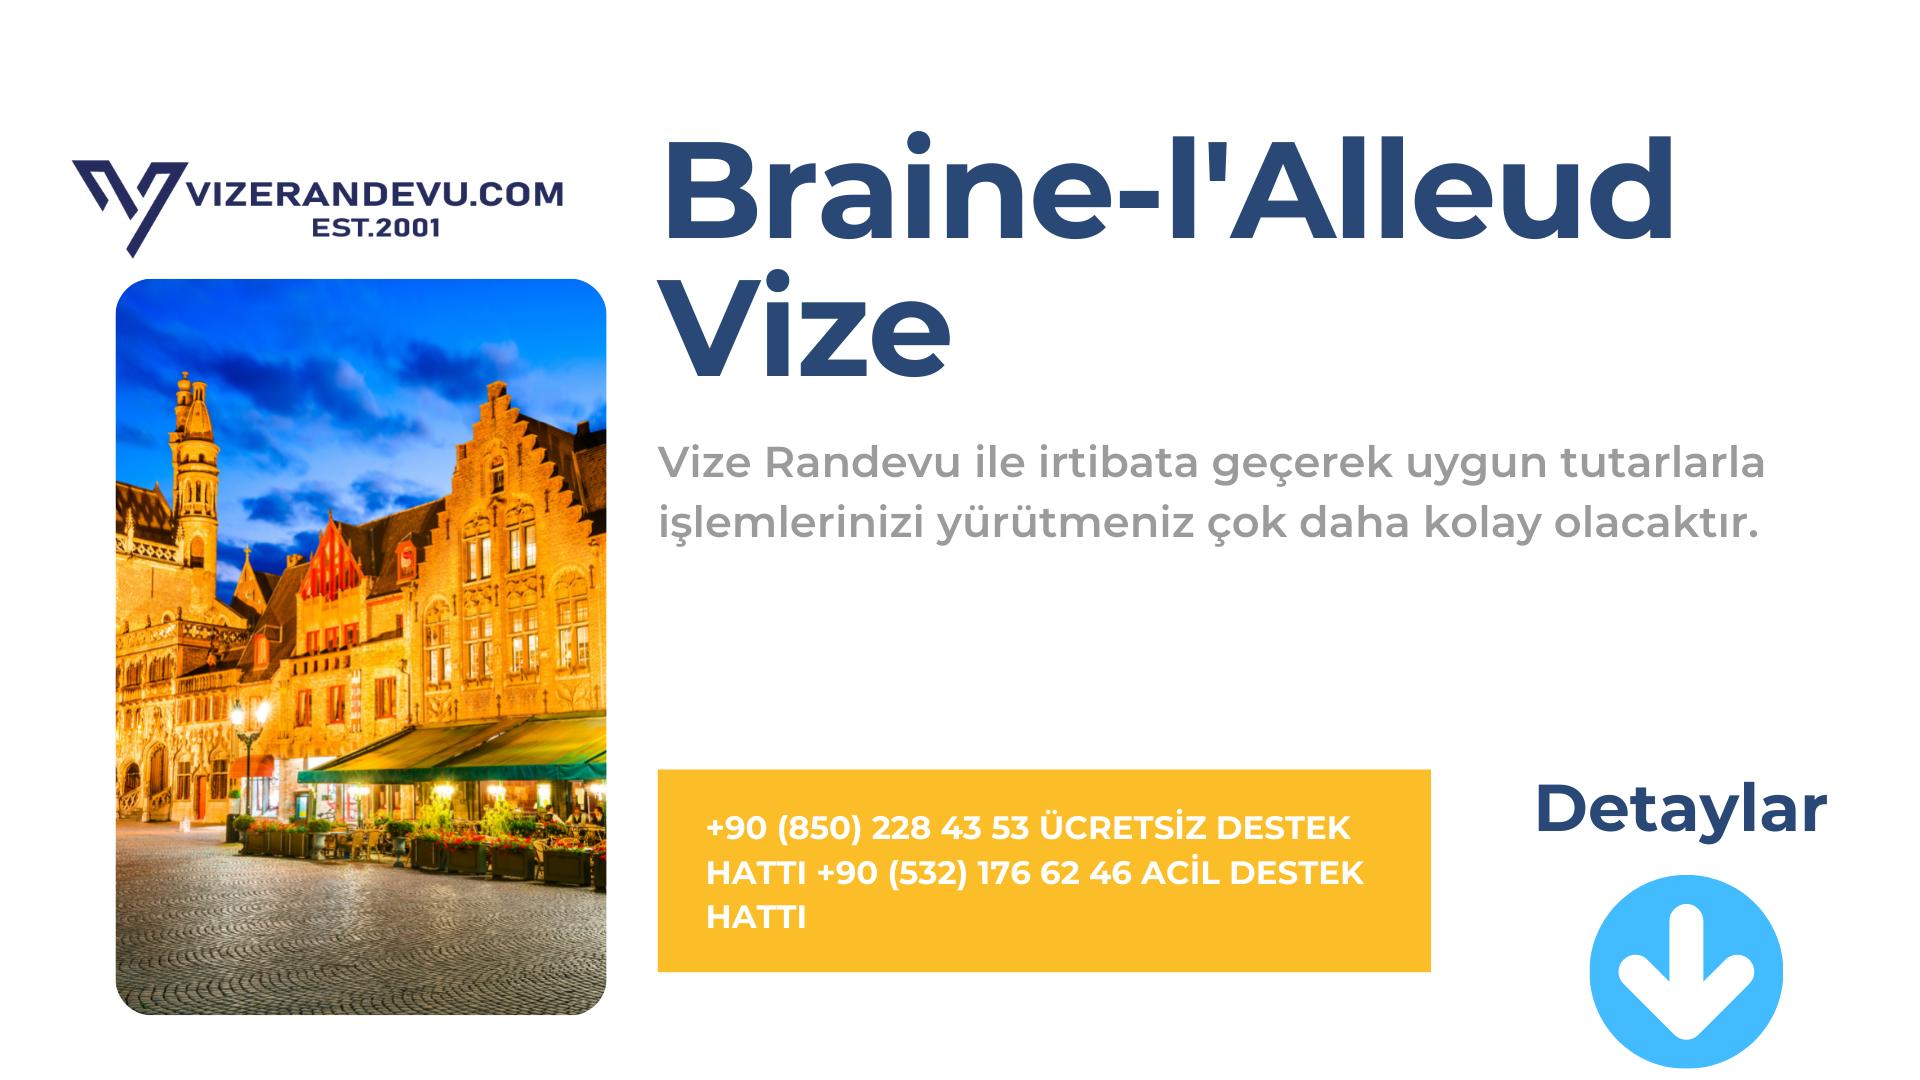 Braine-l'Alleud Vize